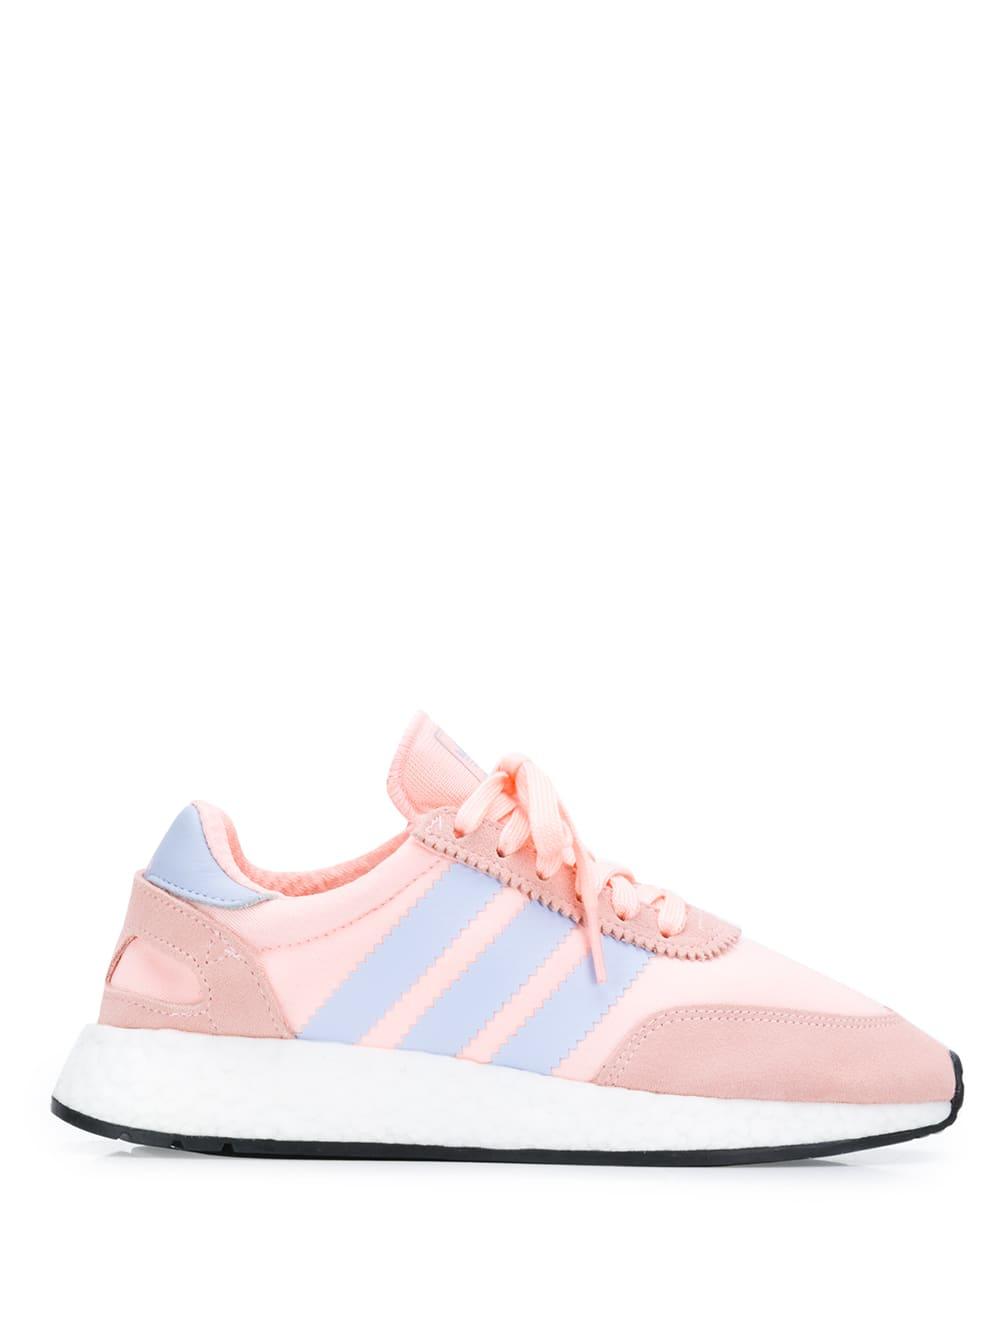 schöne Schuhe Trennschuhe mehr Fotos adidas low top sneakers